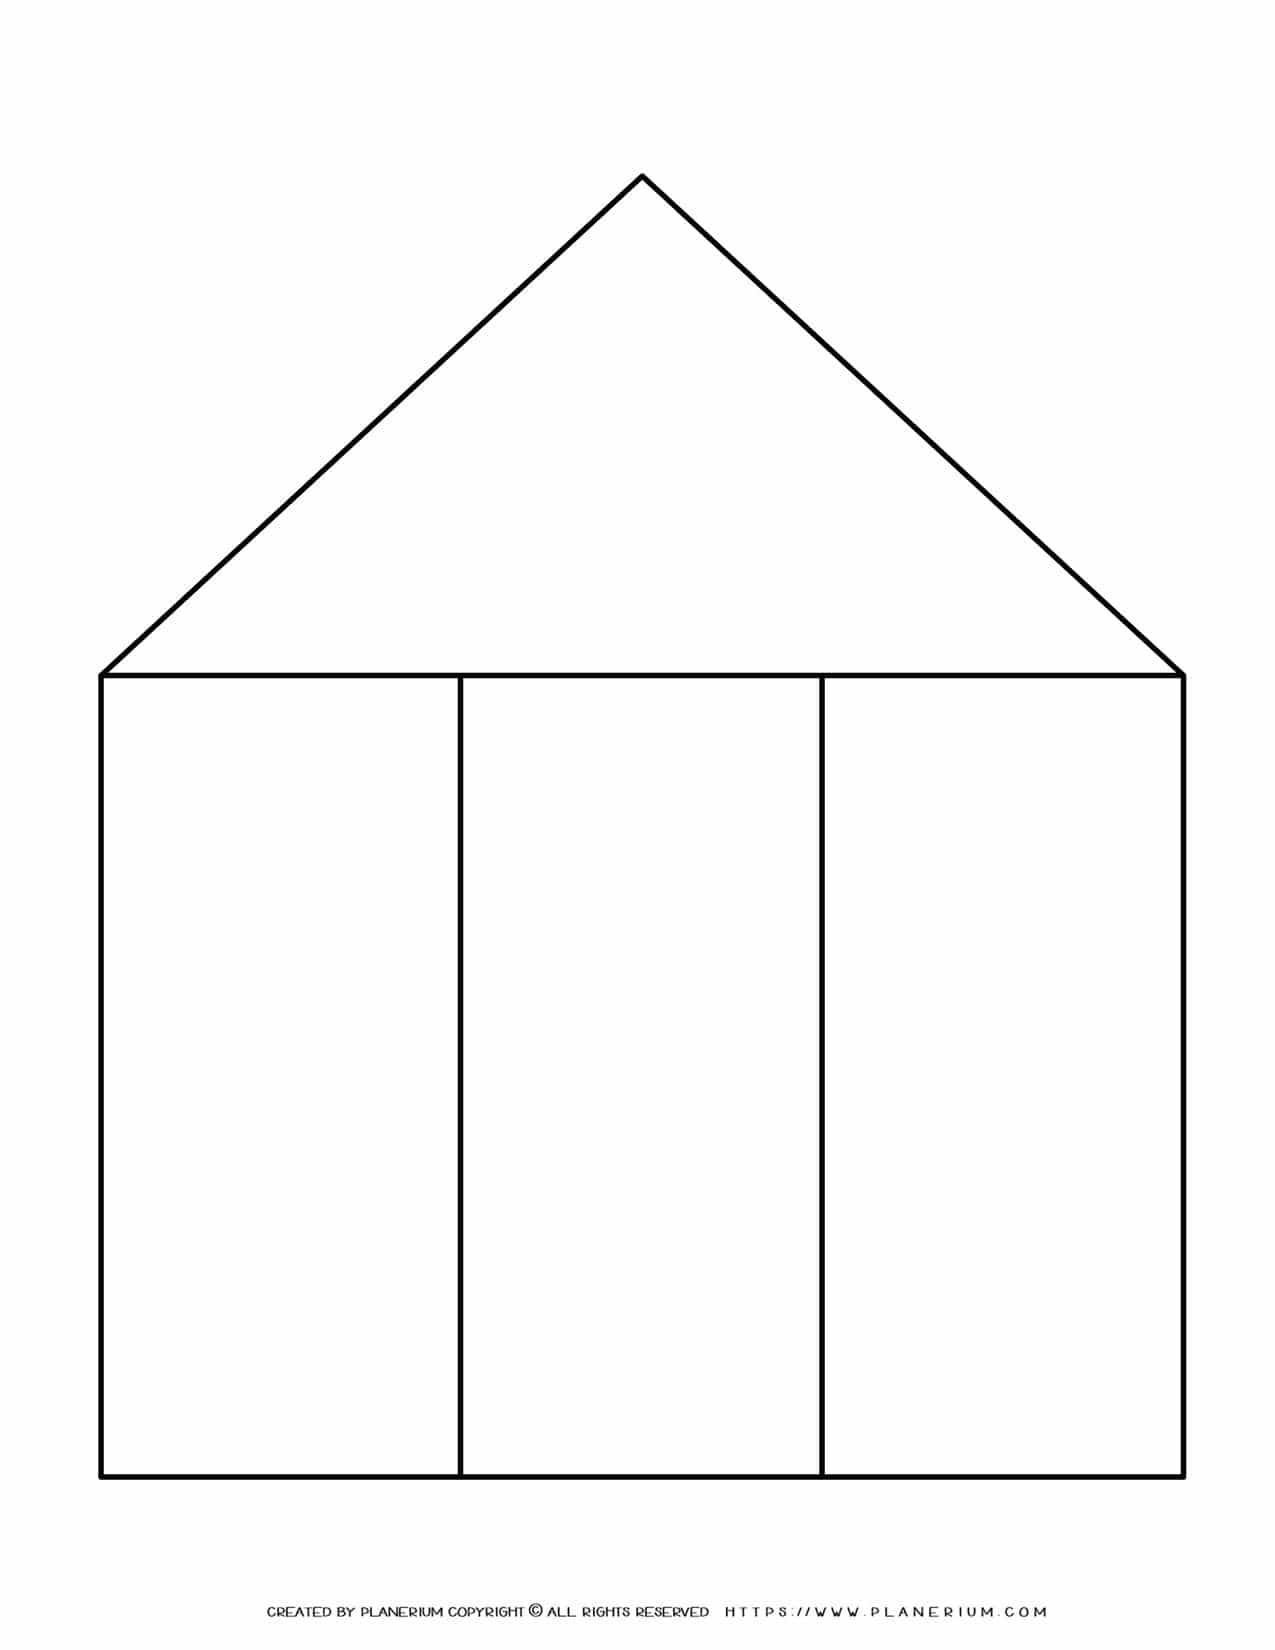 Graphic Organizer Templates - House Chart with Three Columns | Planerium